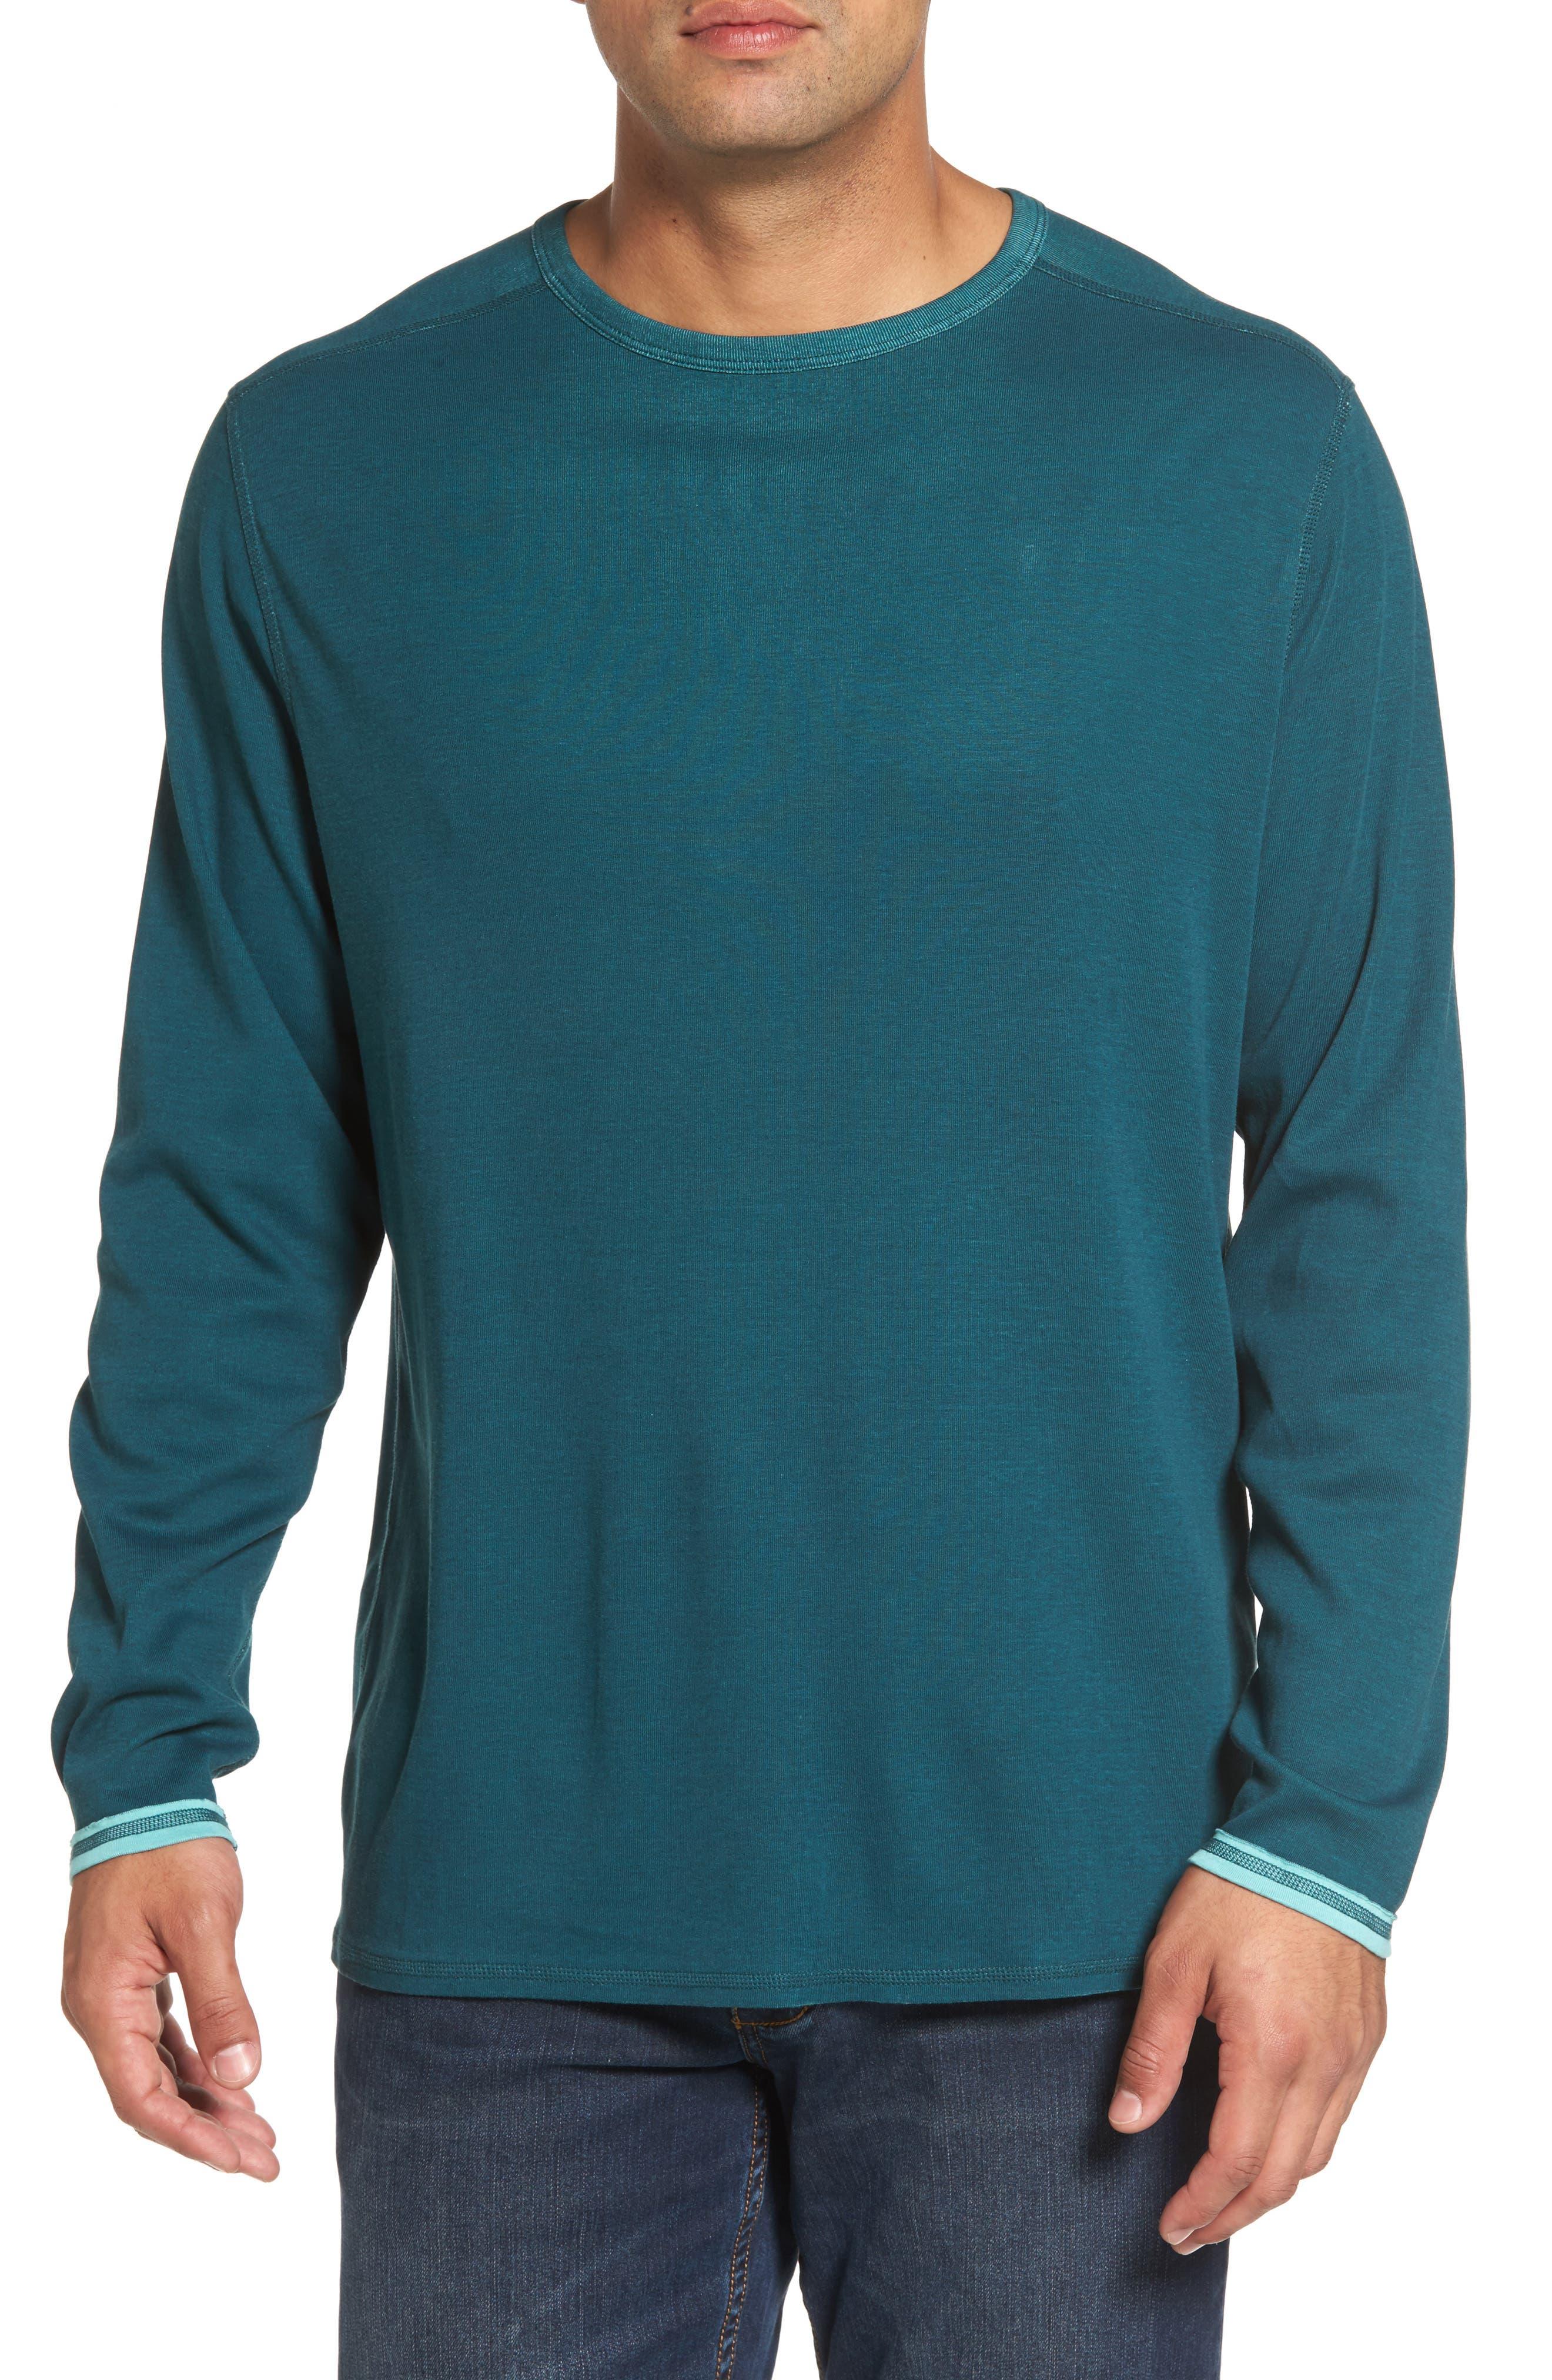 Dual in the Sun Reversible T-Shirt,                             Main thumbnail 1, color,                             300